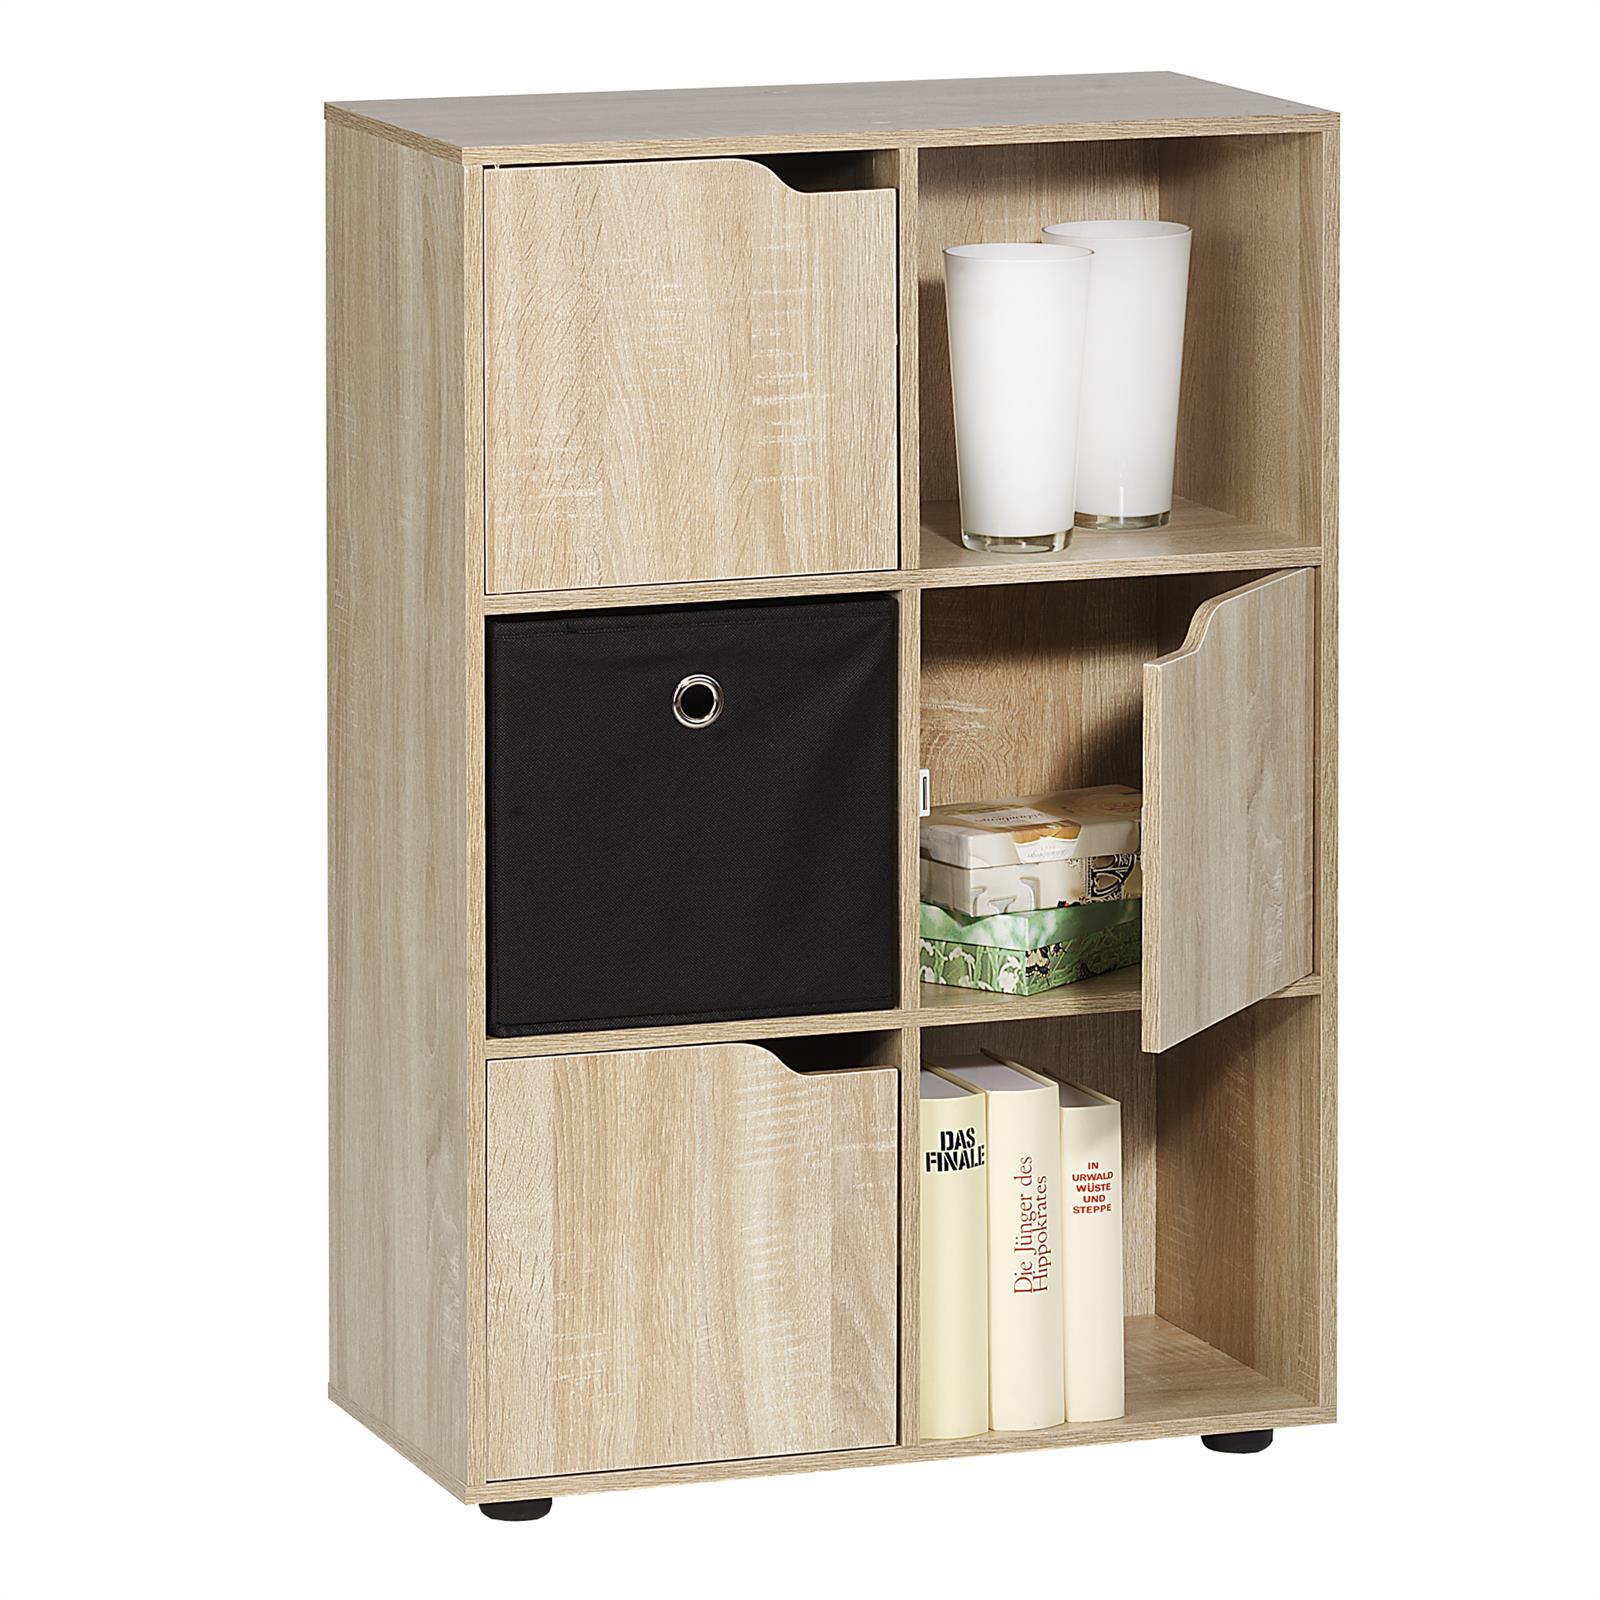 b cherregal vermont in sonoma eiche 60 x 90 cm caro m bel. Black Bedroom Furniture Sets. Home Design Ideas